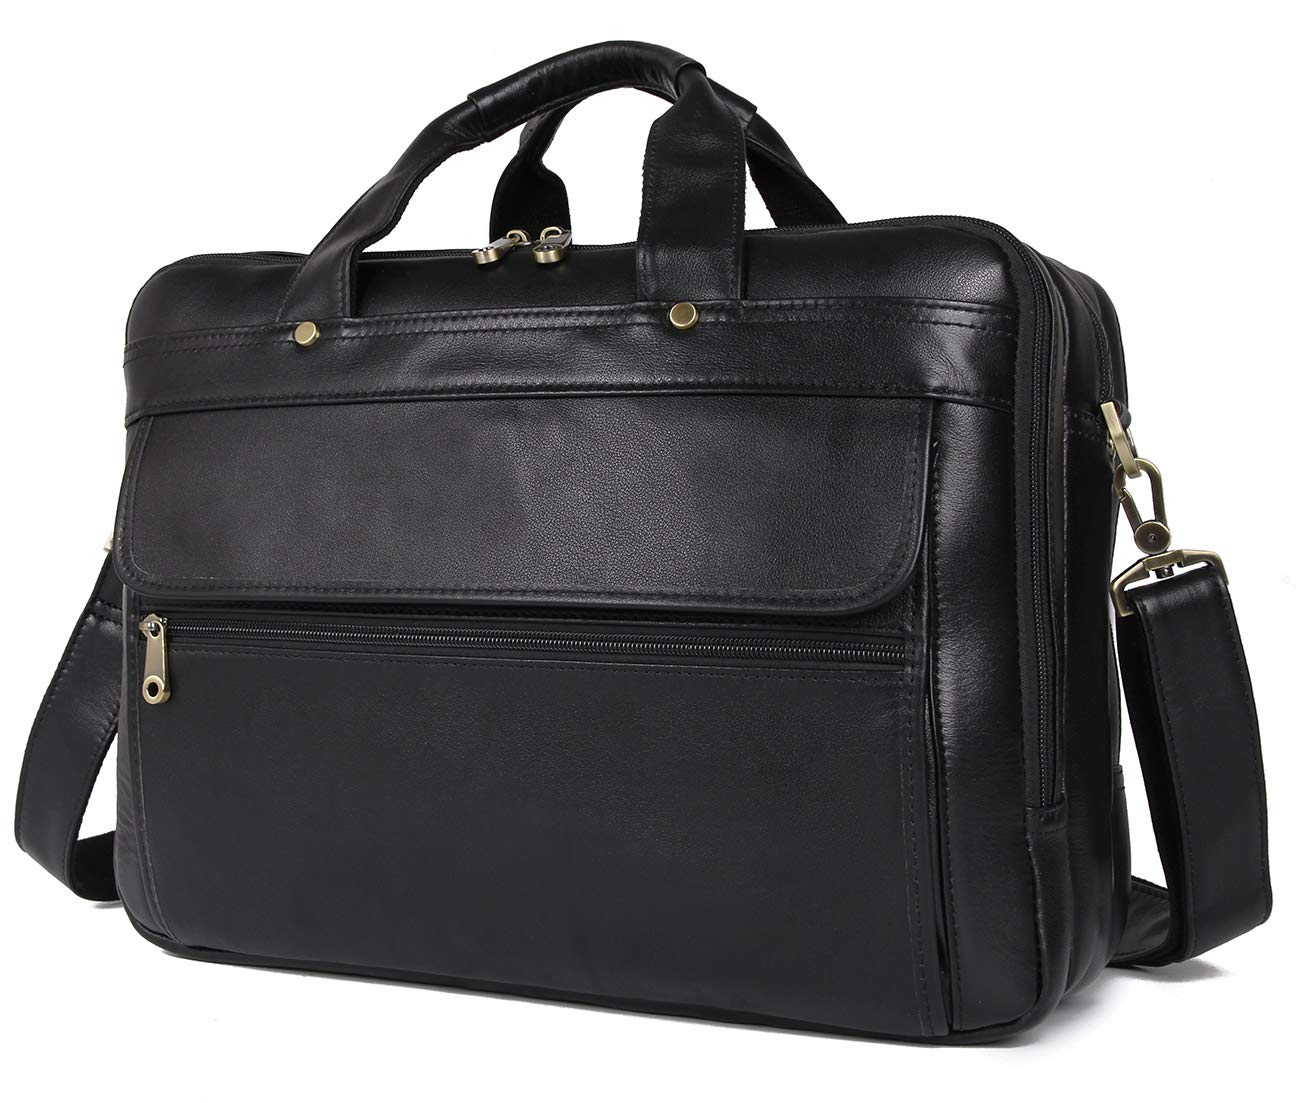 Polare Natural Napa Leather Men's 16'' Black Business Briefcase/Laptop Bag